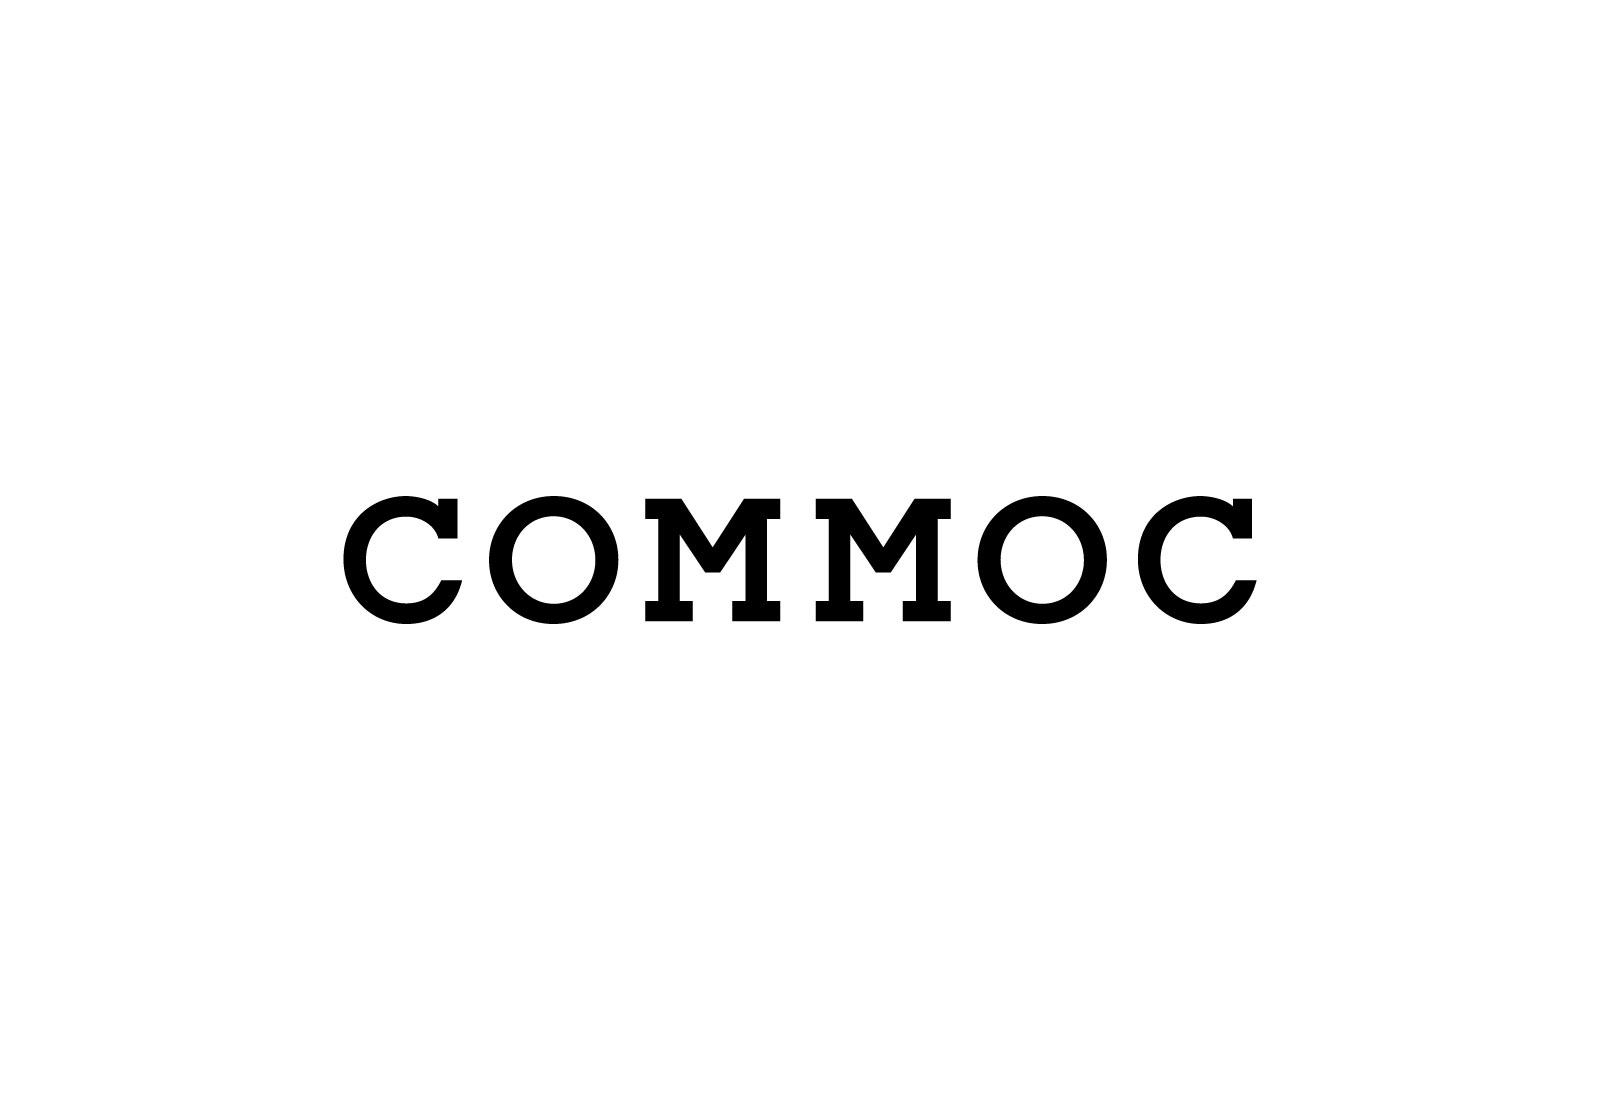 COMMOC